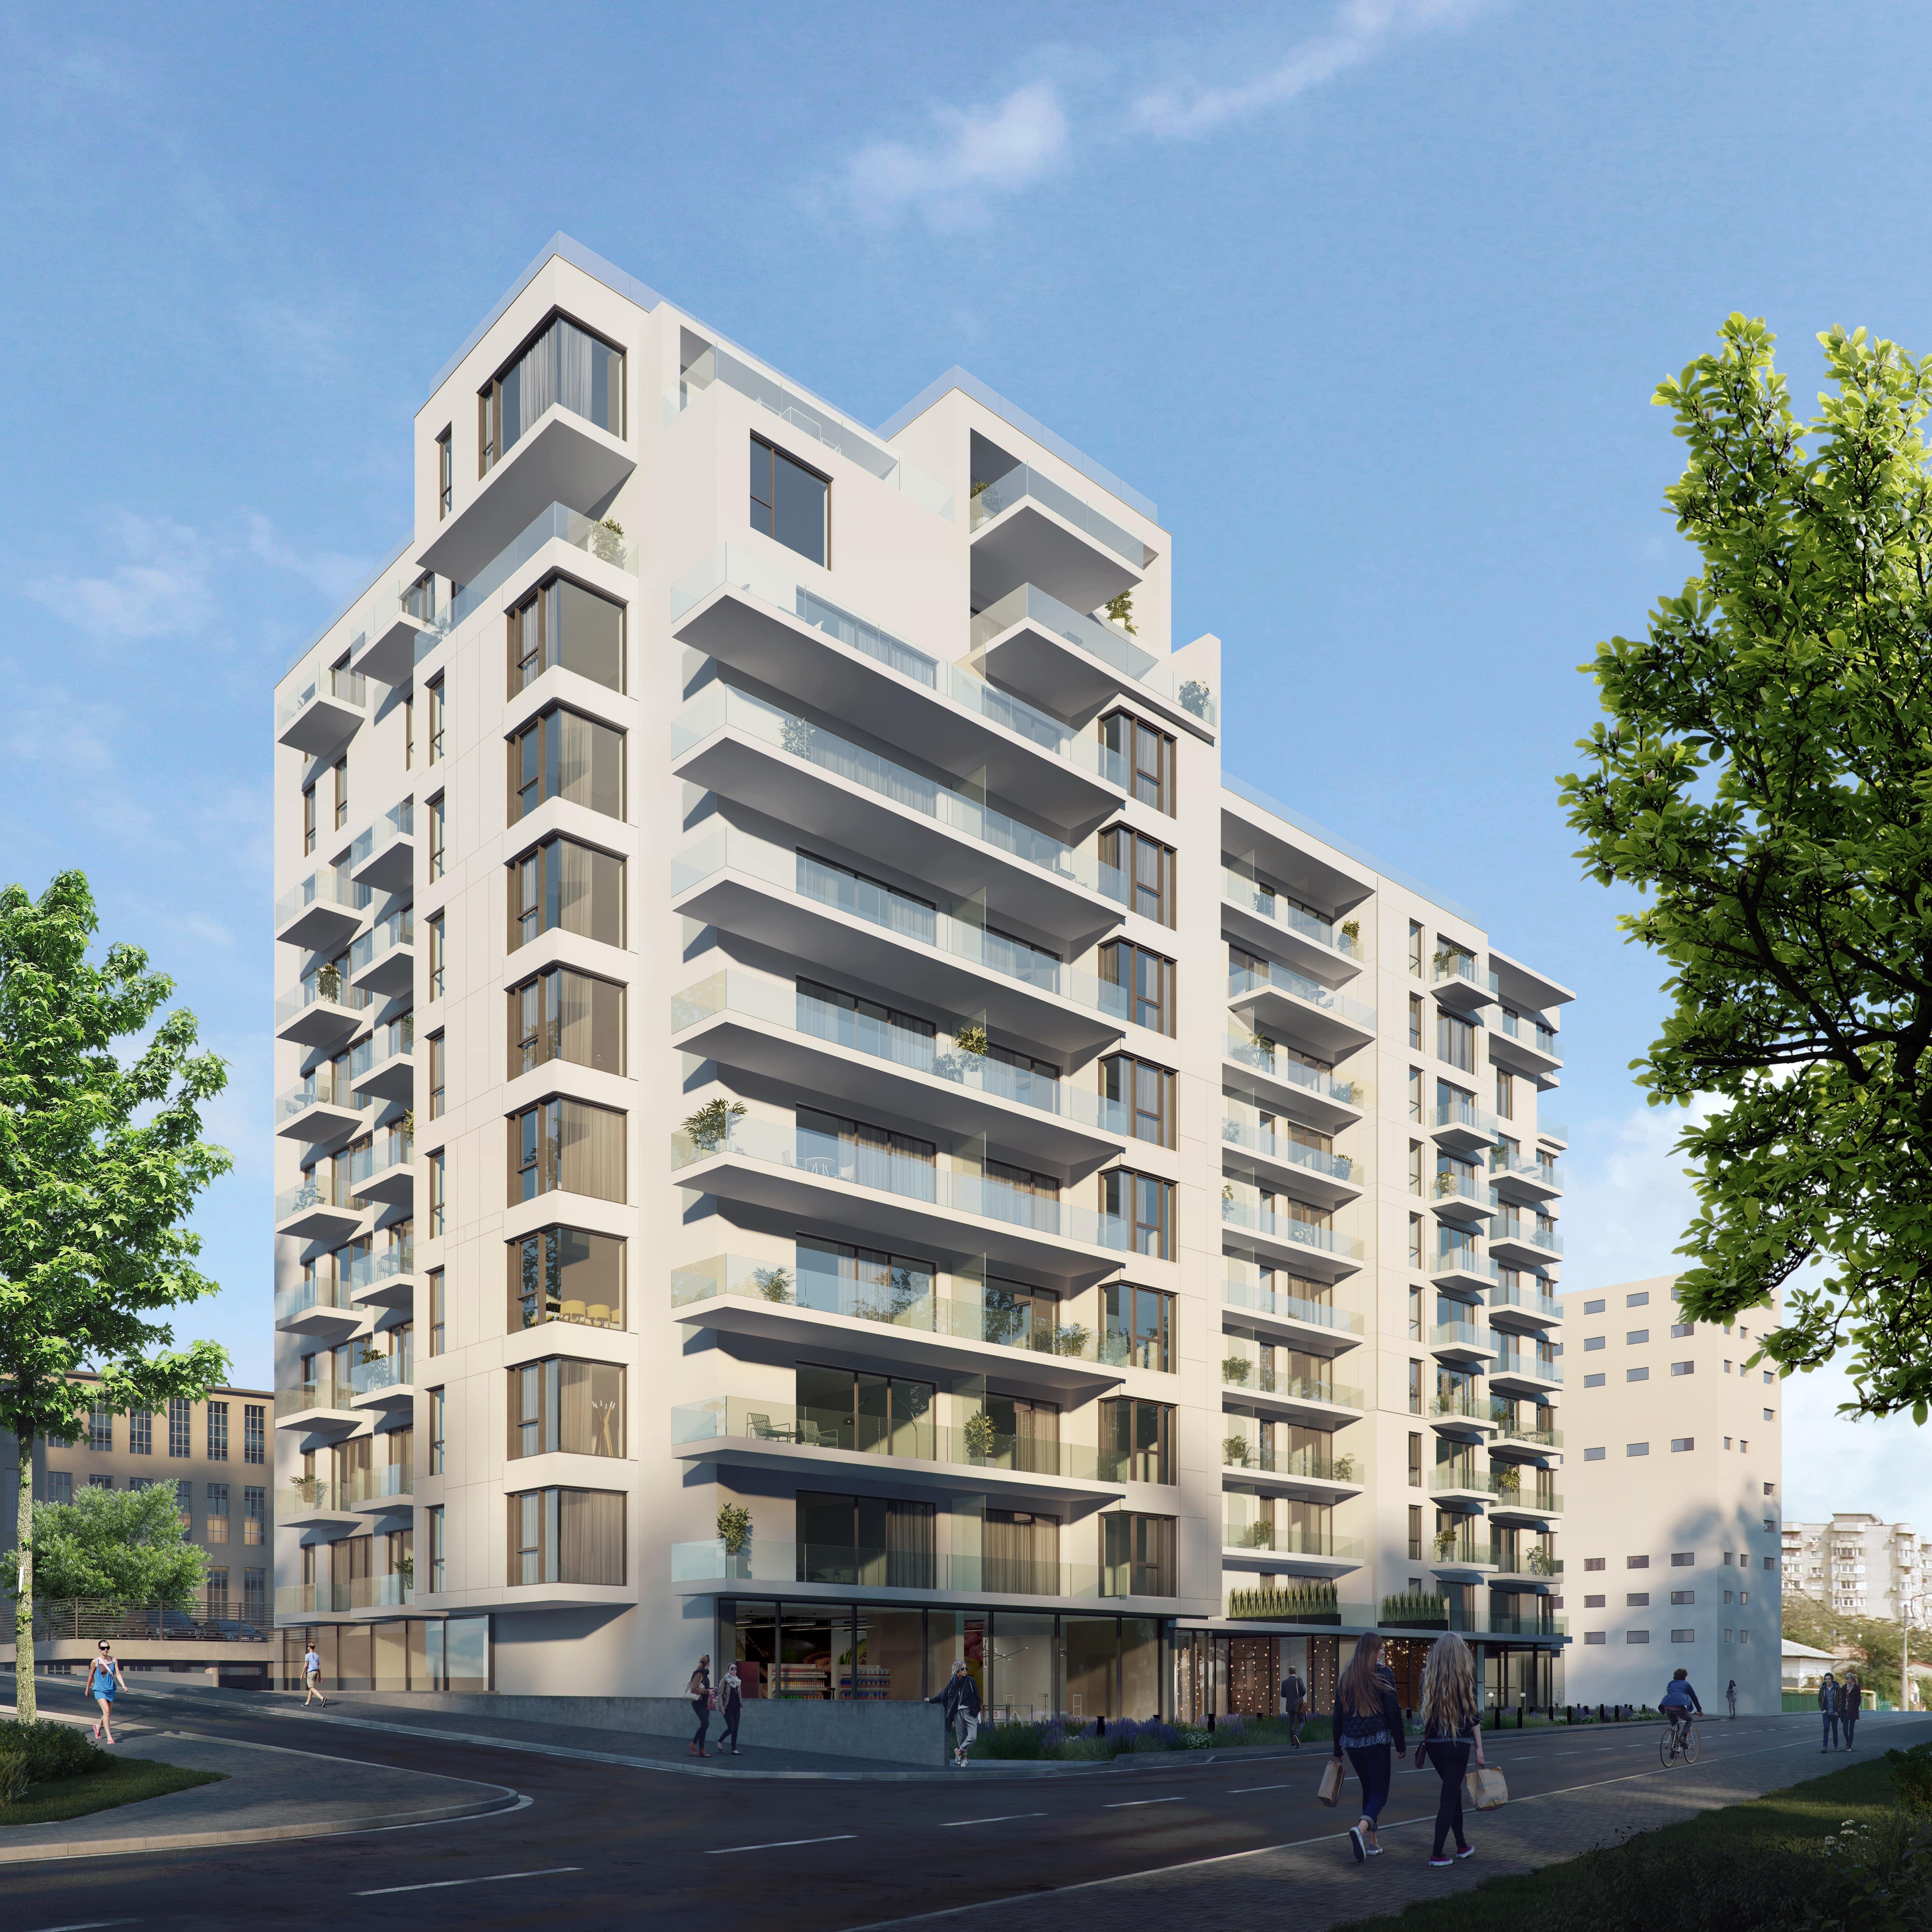 https://ahe-ro.s3.amazonaws.com/8272/penthouse-si-apartamente-unirii-%286%29.jpg